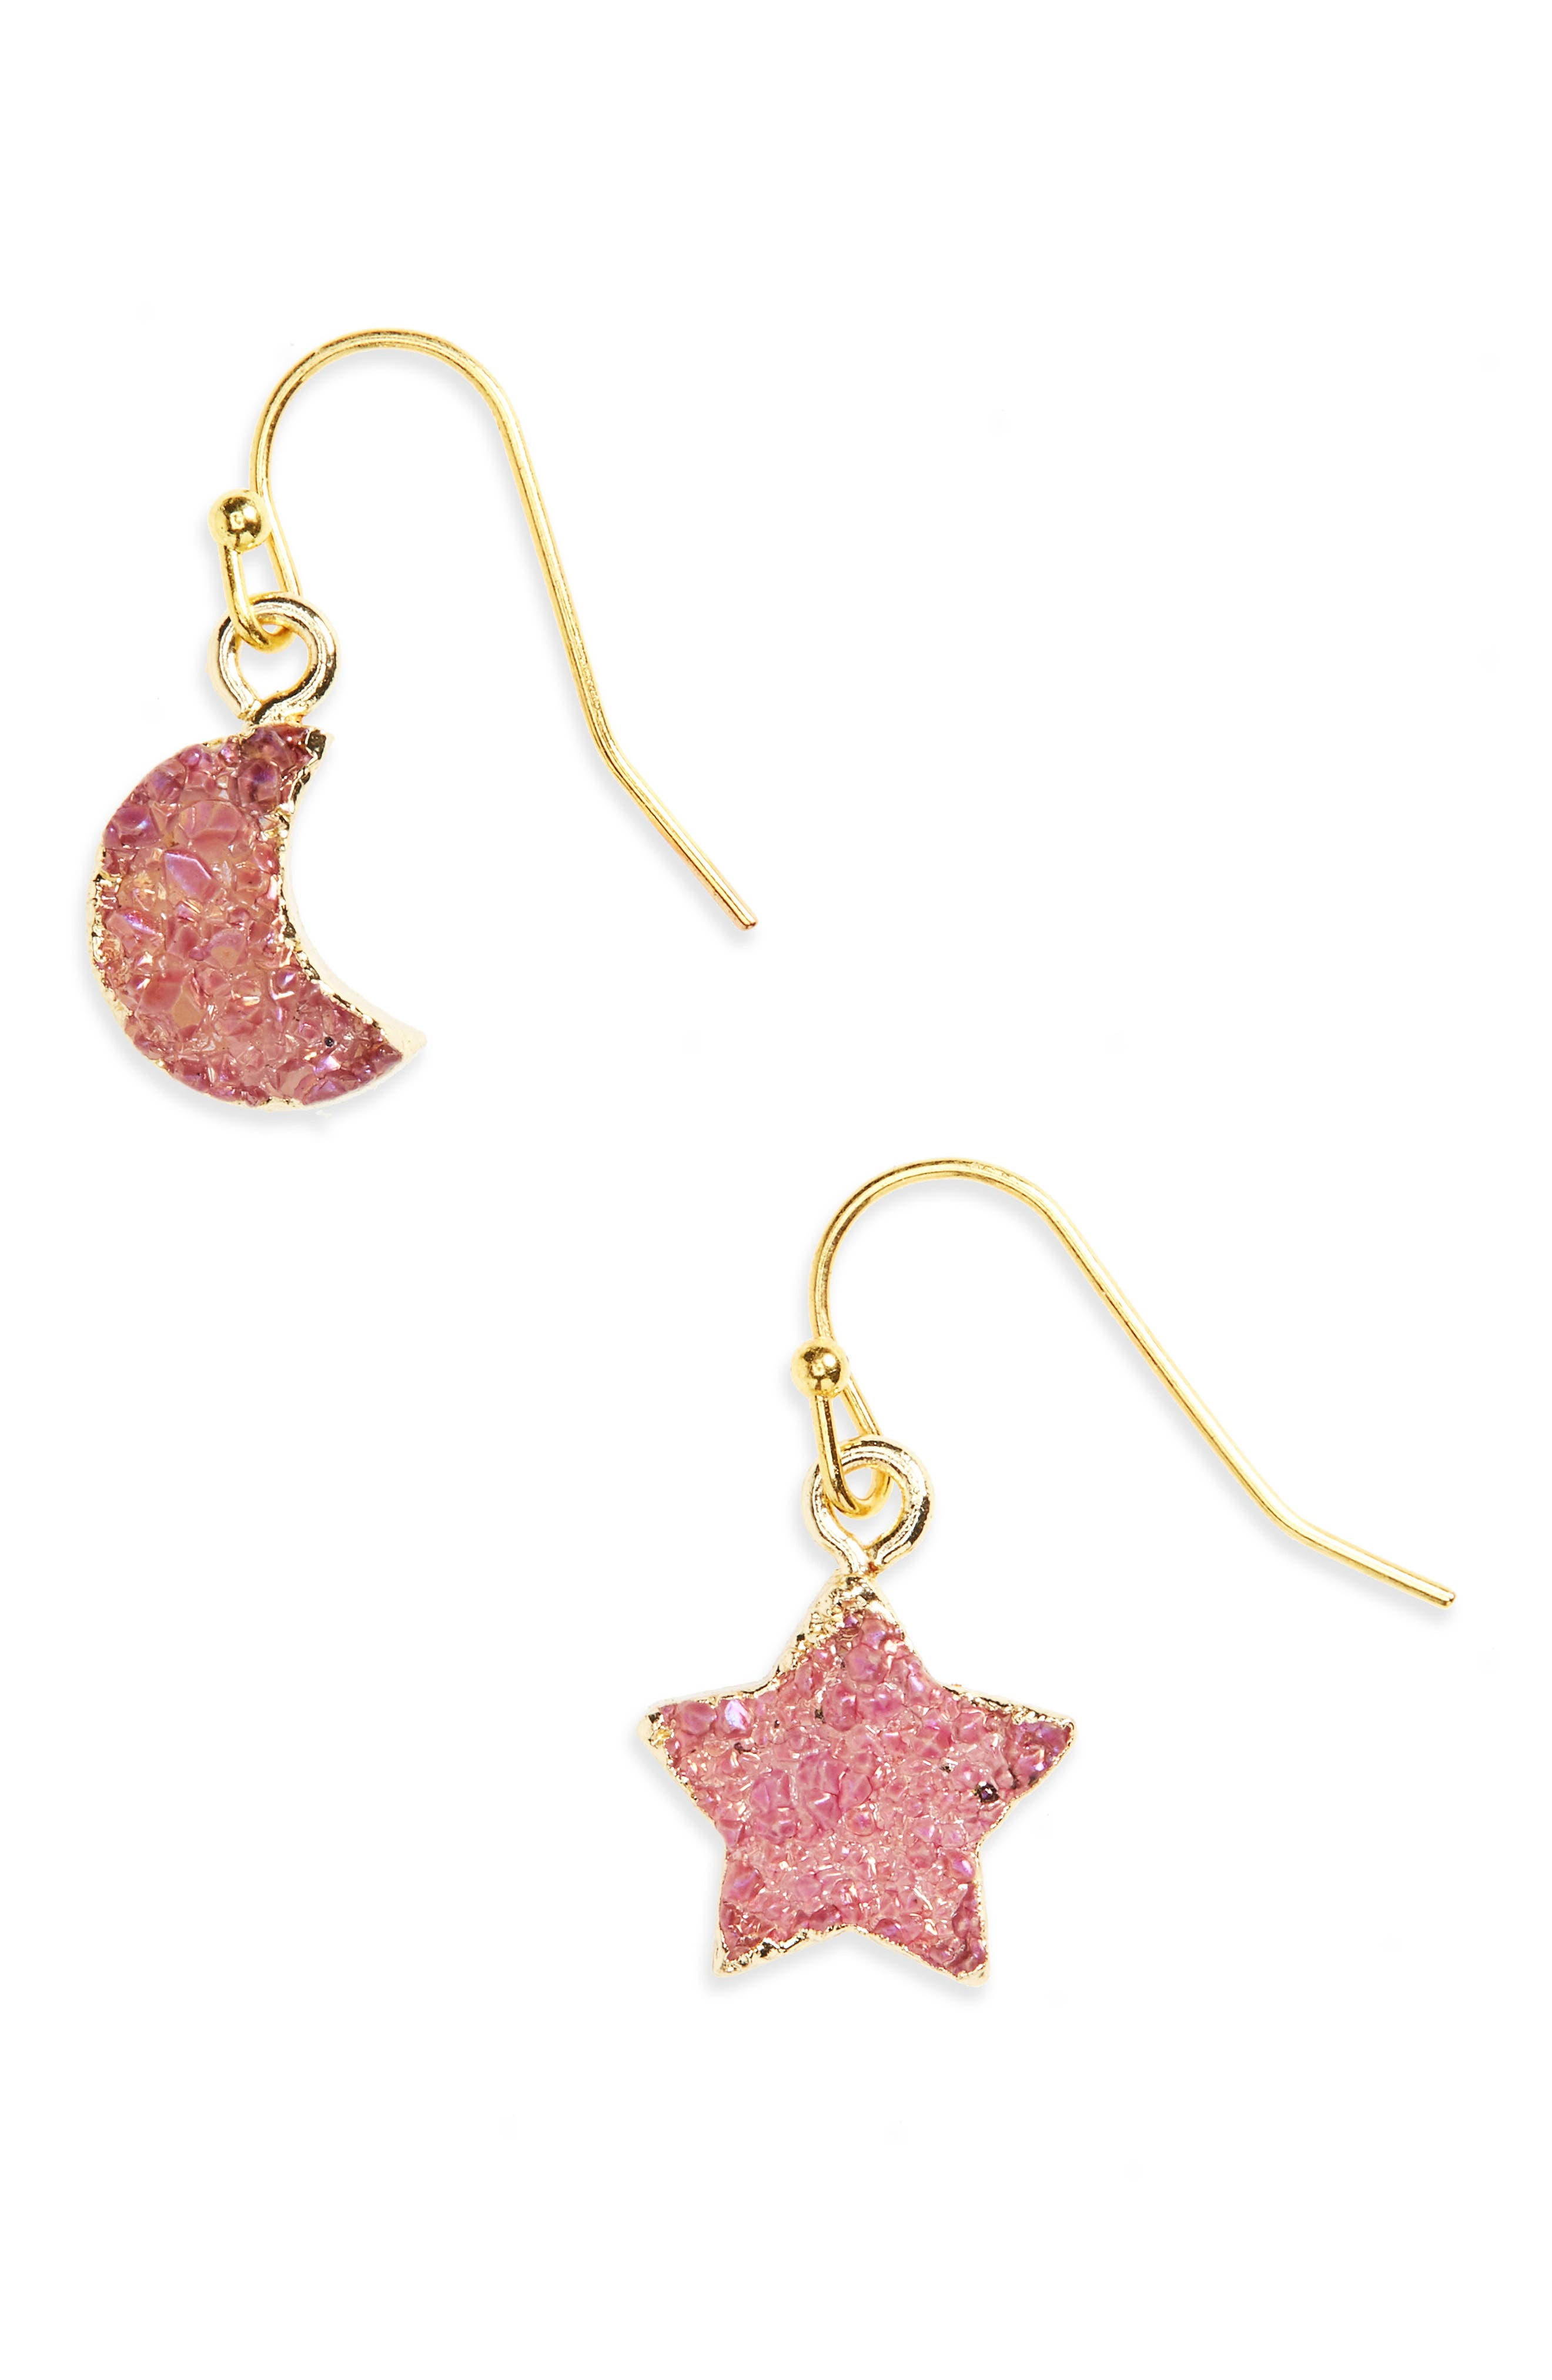 Moon & Star Drusy Stone Earrings,                             Main thumbnail 1, color,                             400